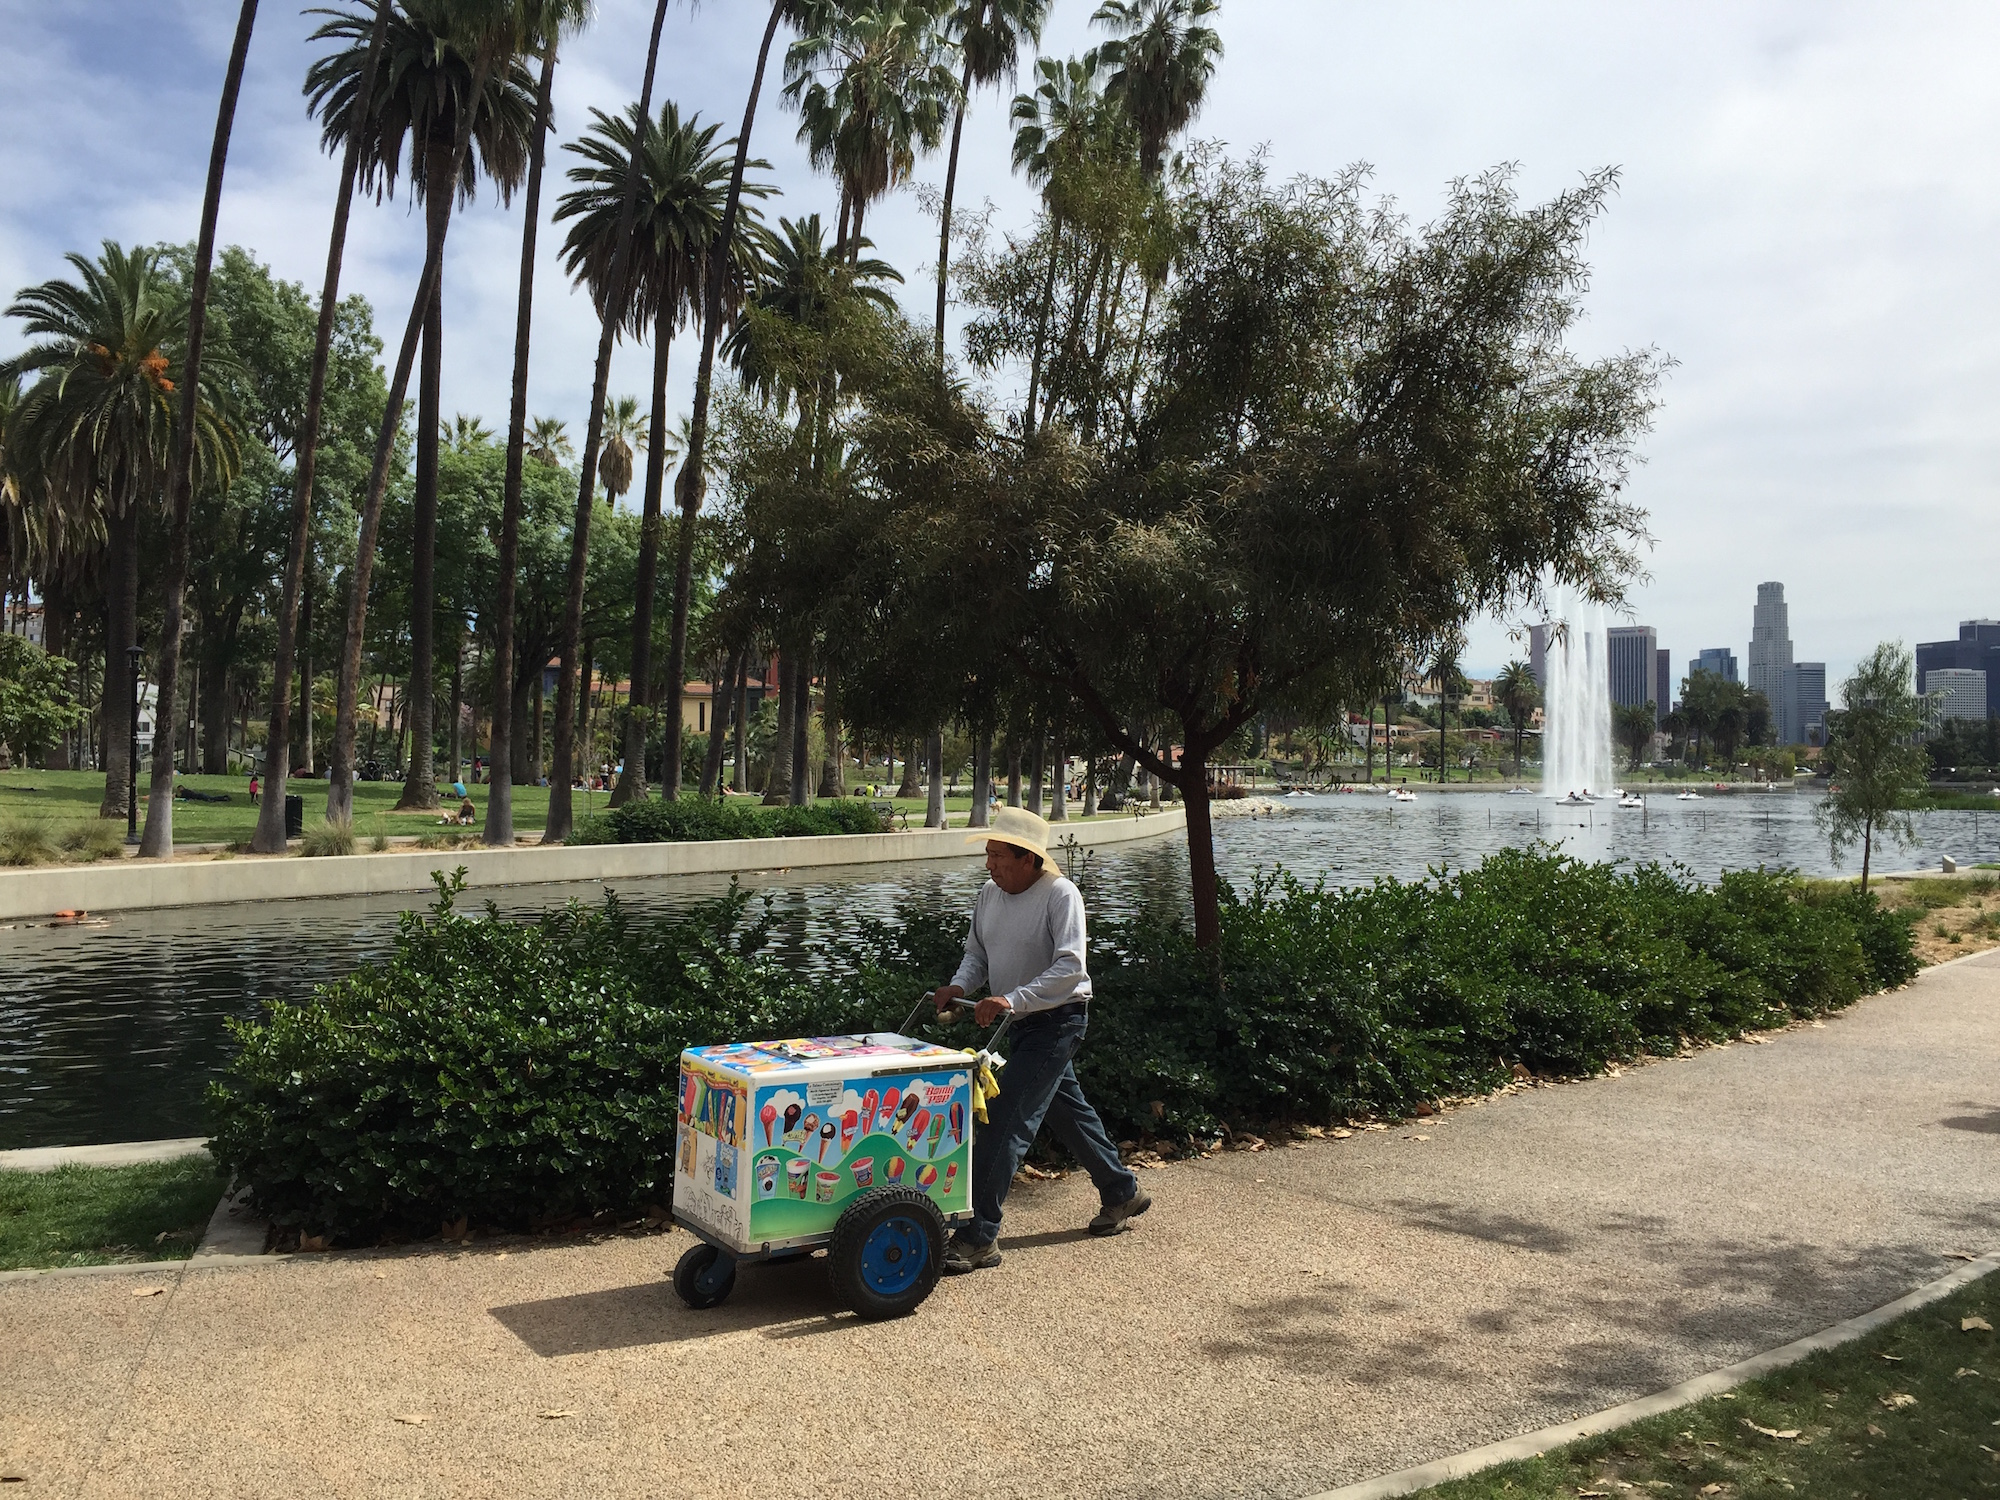 A vendor sells at Echo Park Lake on a sunny day, pushing a cart of paletas.